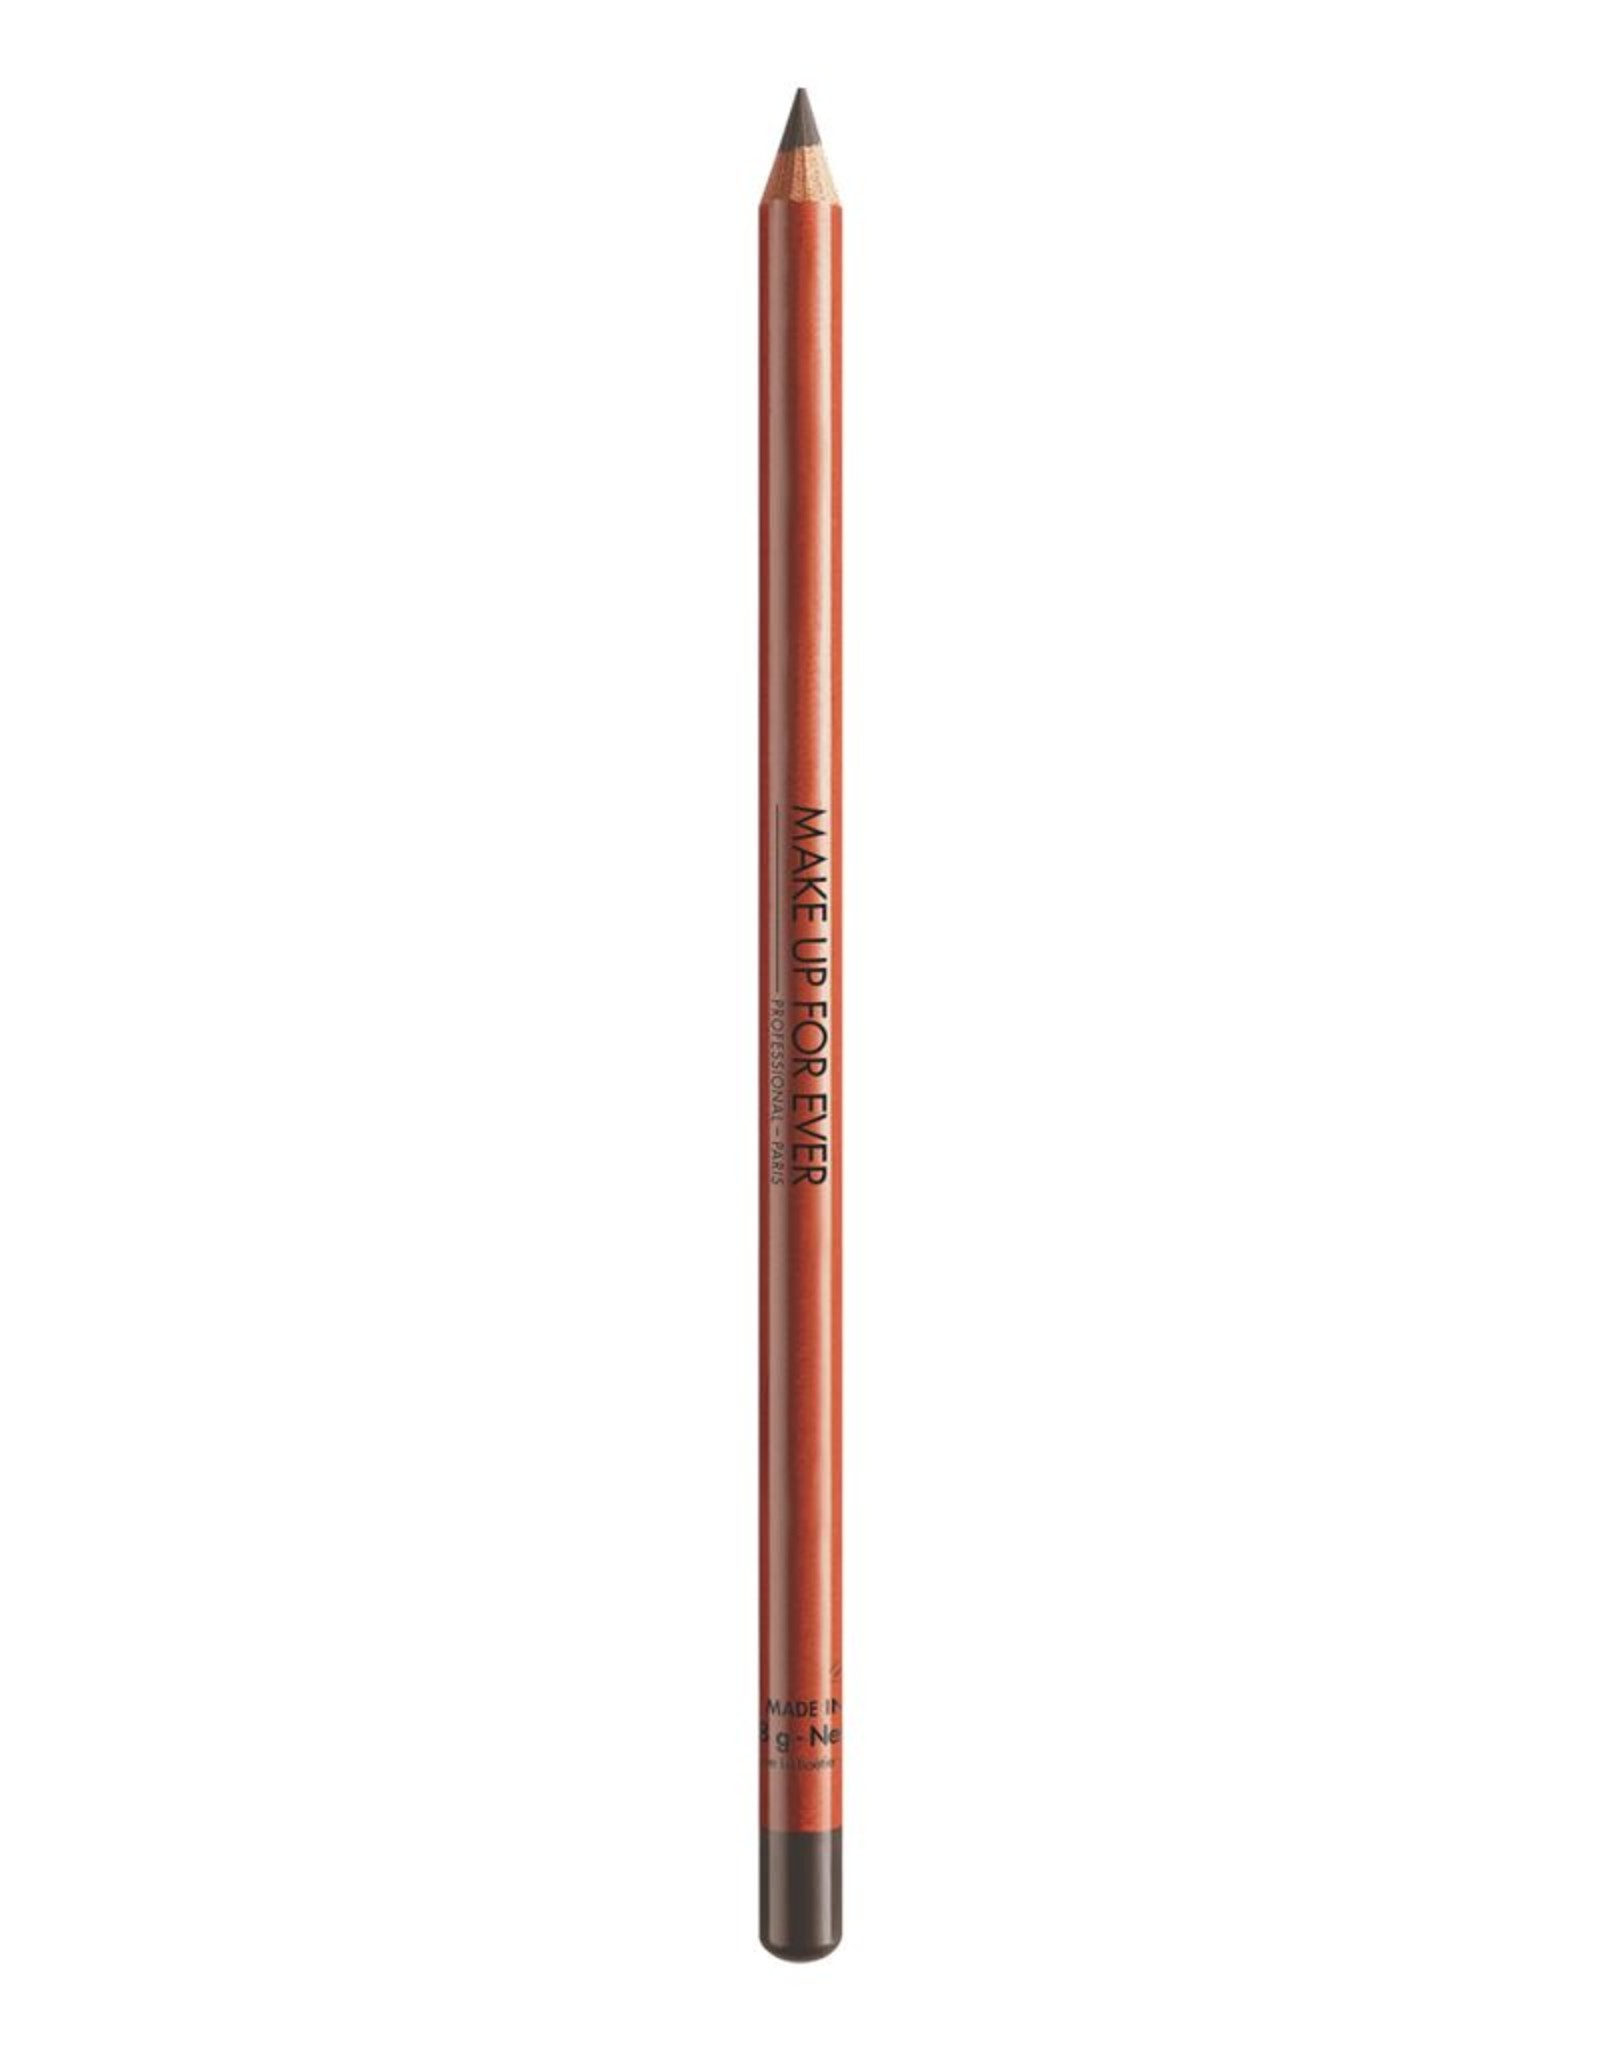 MUFE CRAYON YEUX 1,8gN3 brun fonce /  dark brown